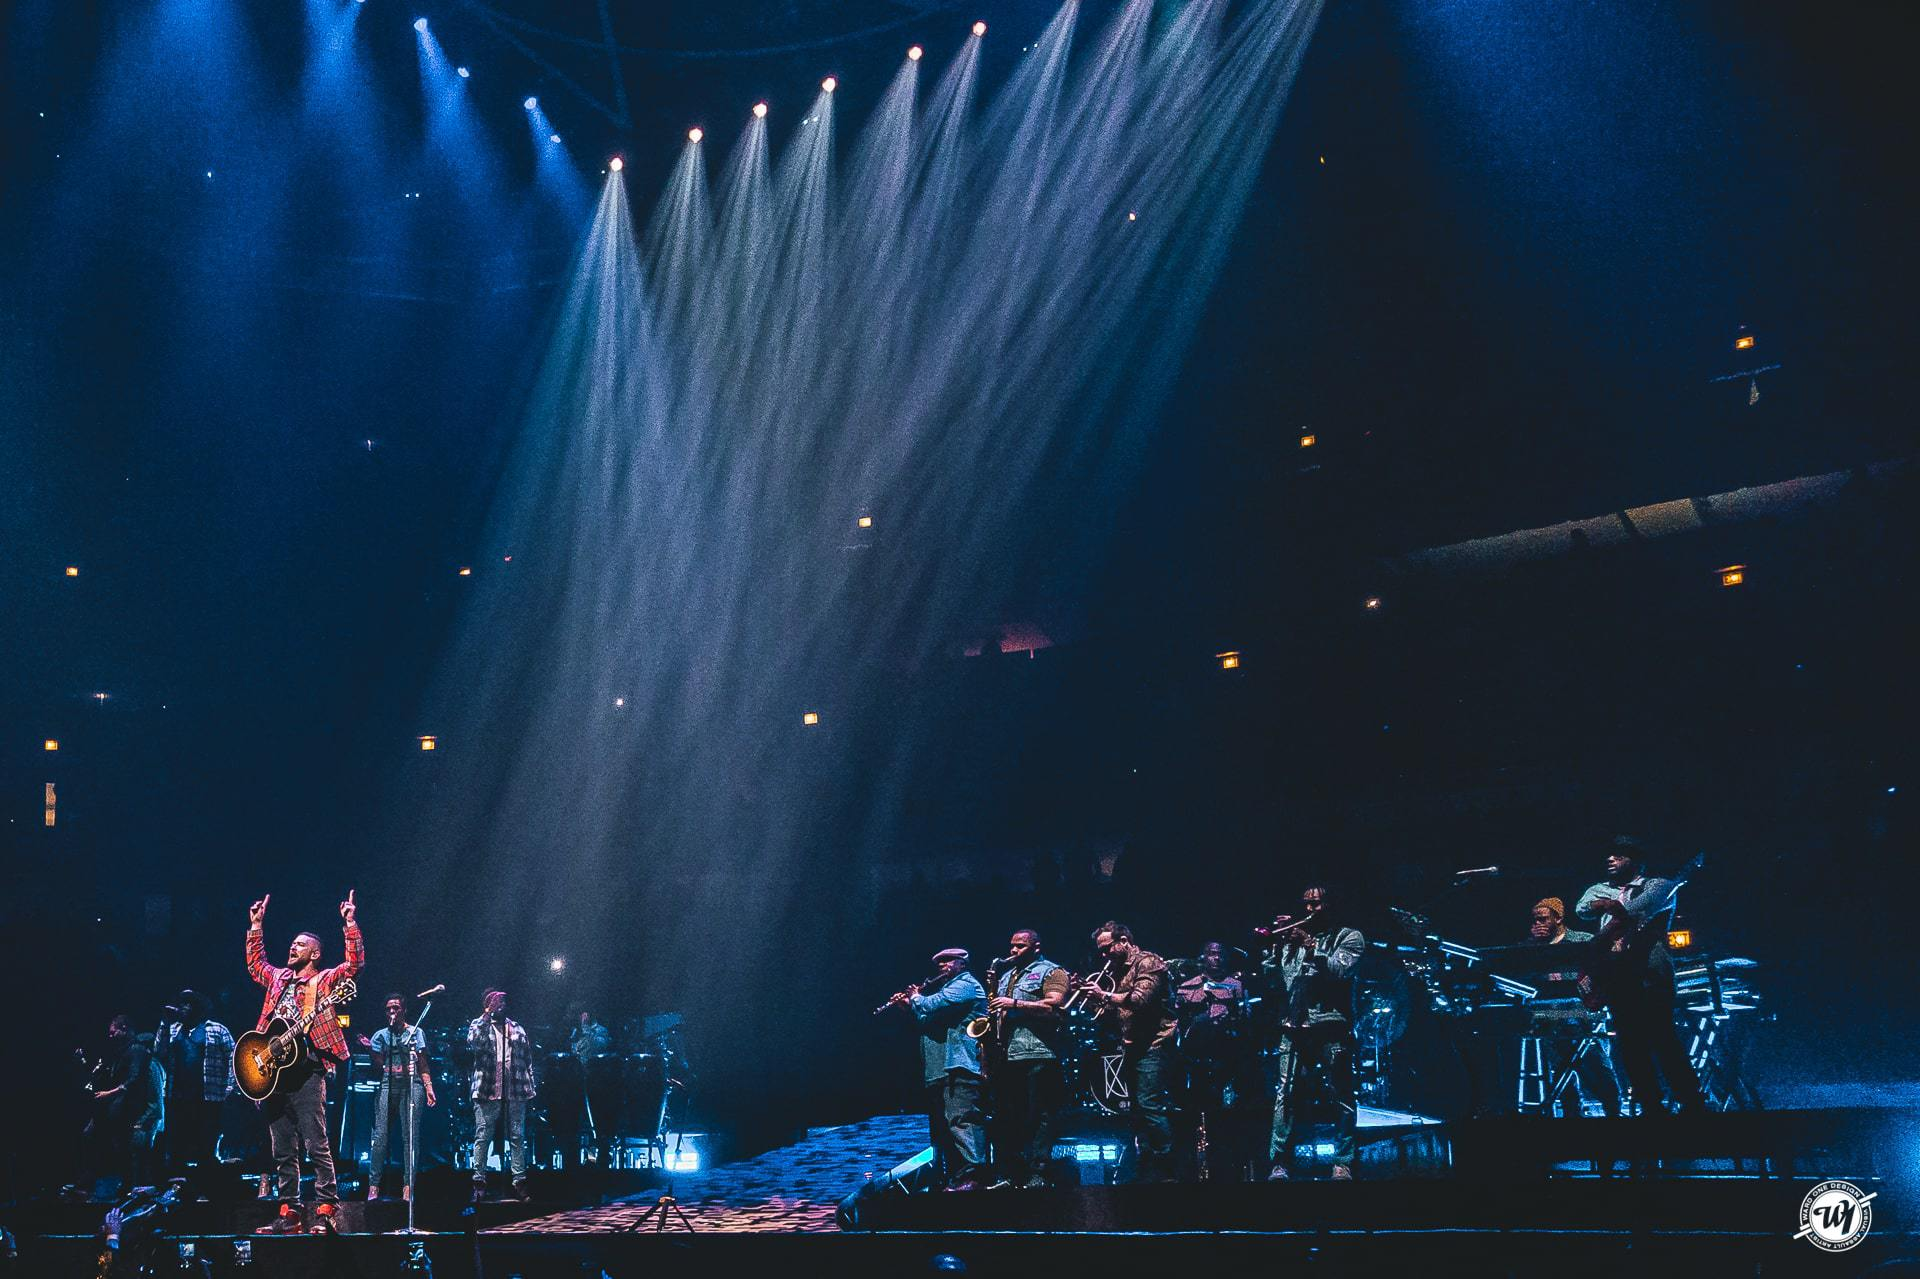 Justin Timberlake - Man of the Woods Tour - Chicago 3.27.2018